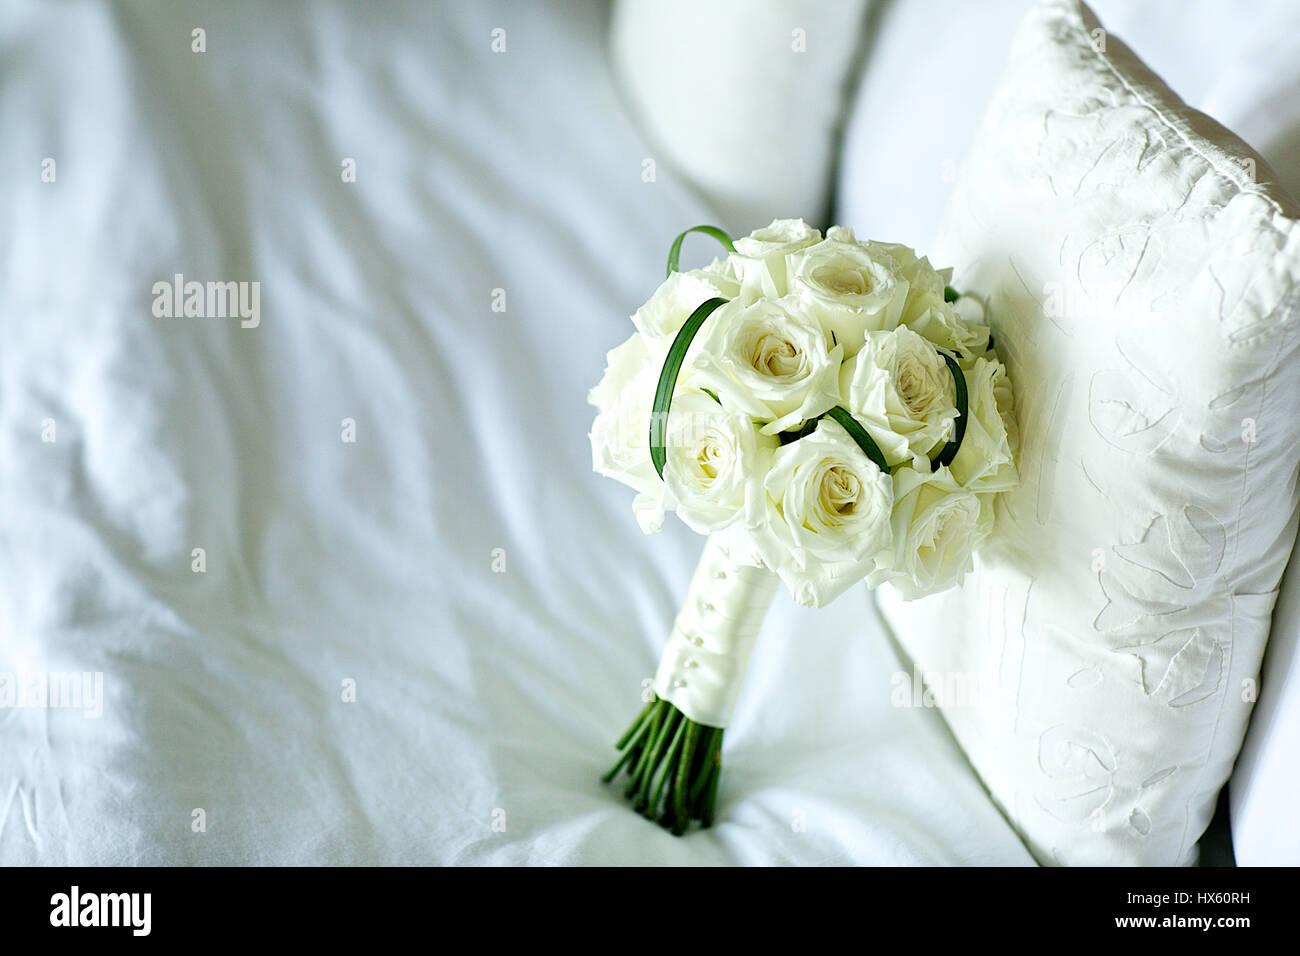 The bueatiful wedding bouquet of fresh flower stock photo 136586005 the bueatiful wedding bouquet of fresh flower izmirmasajfo